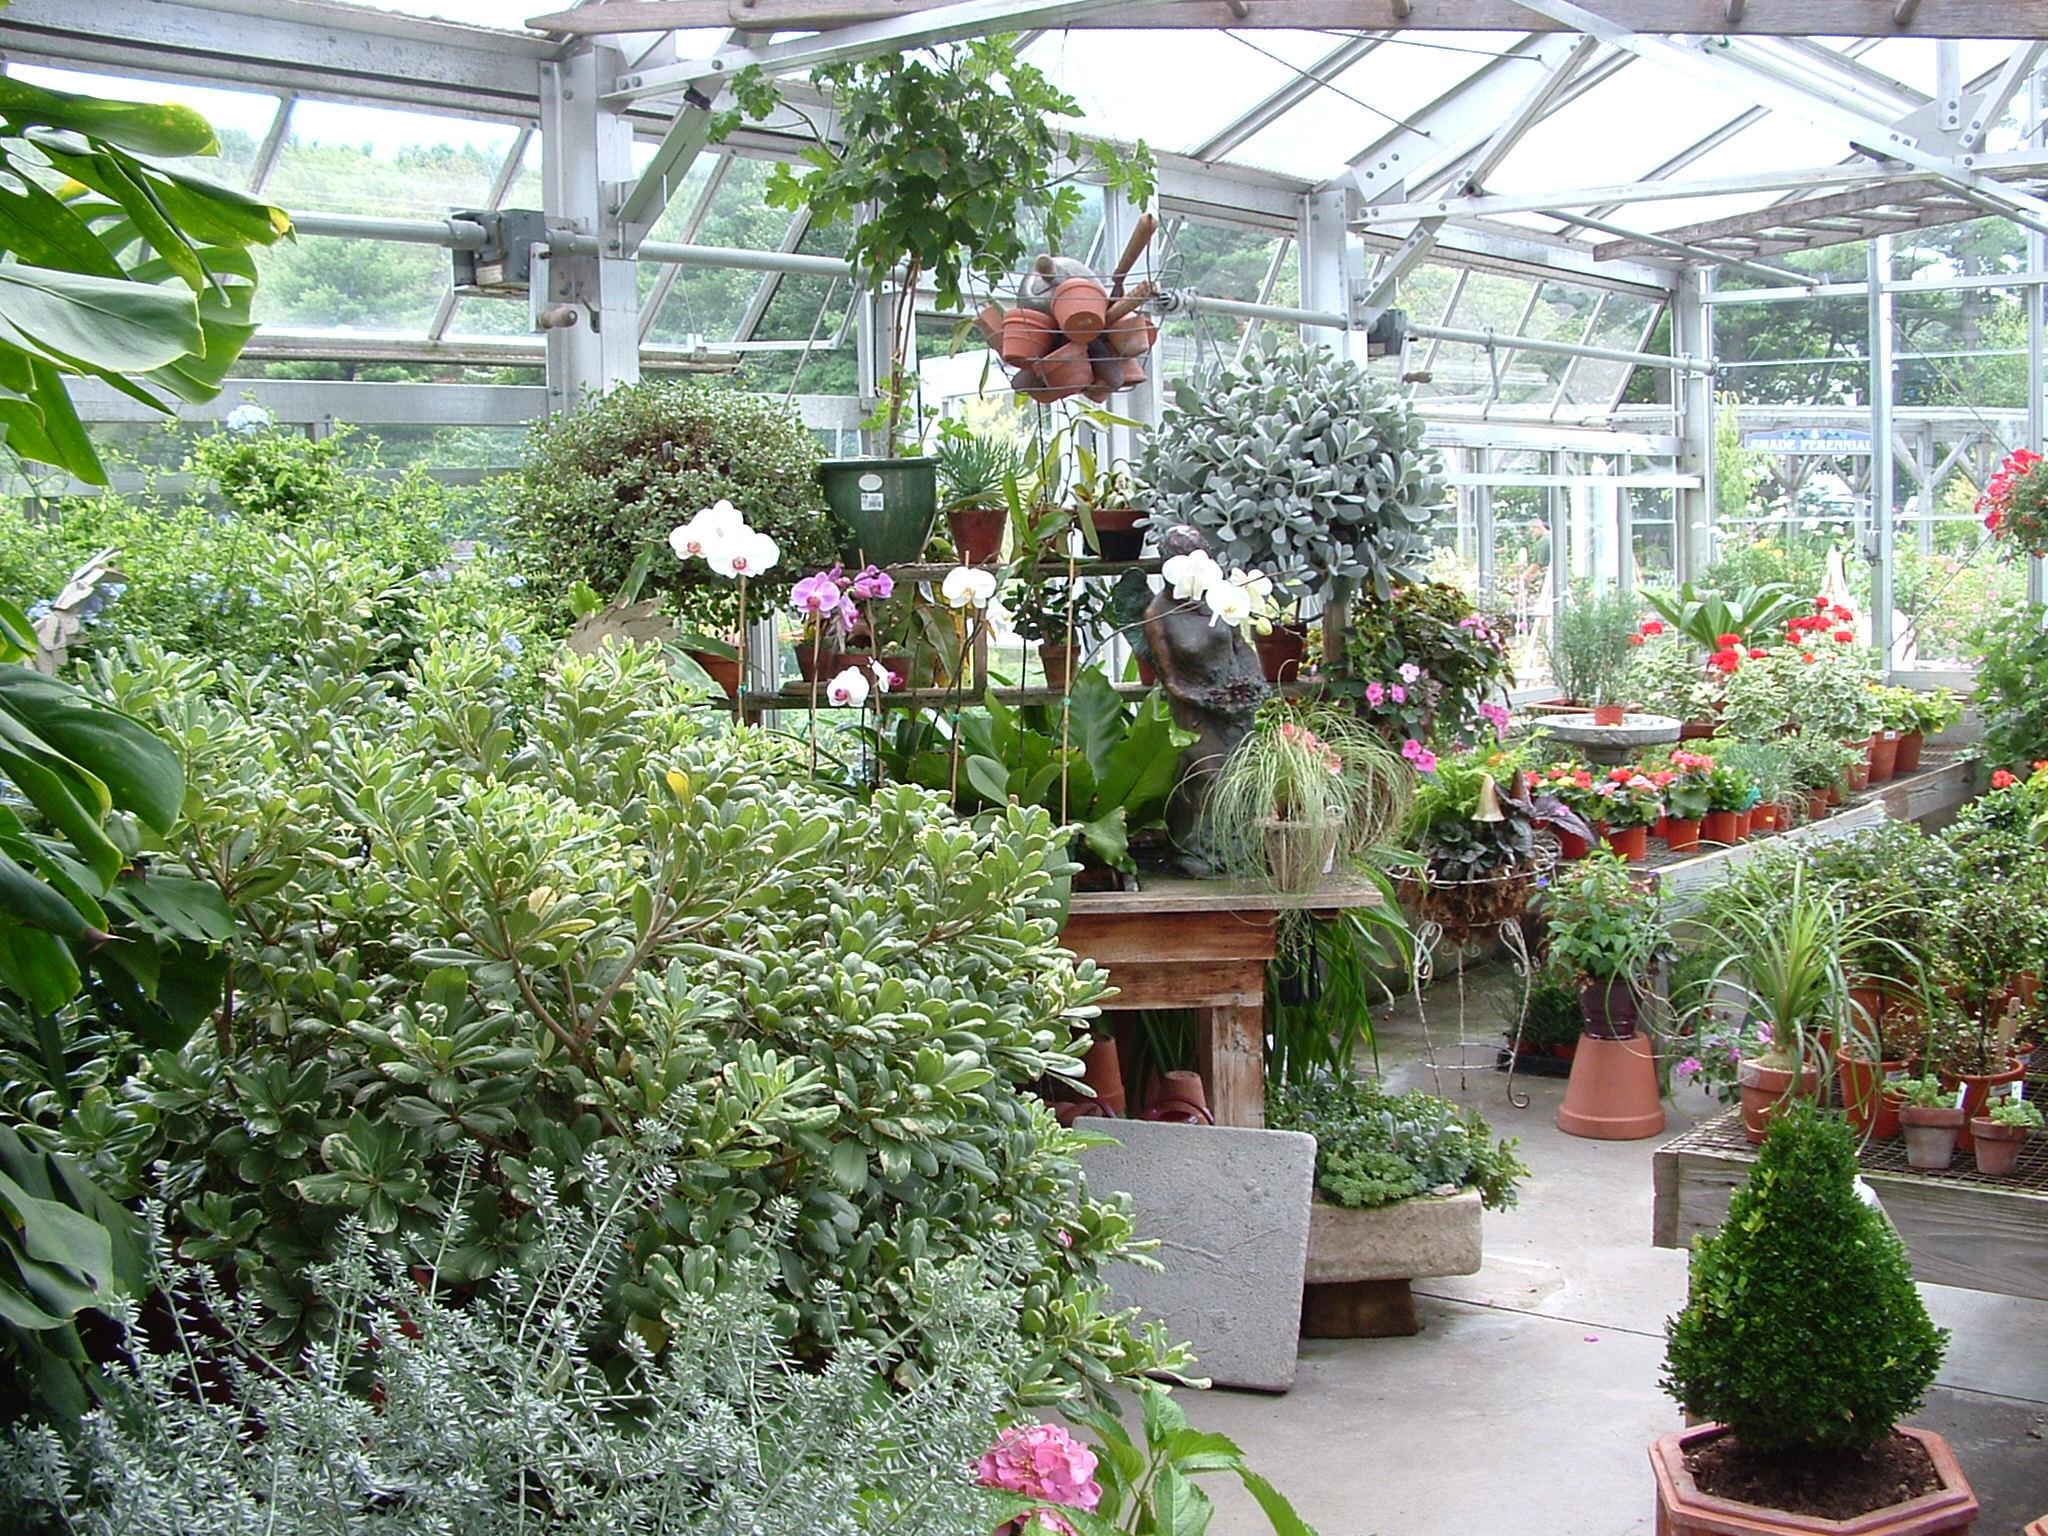 shirleys greenhouse.JPG